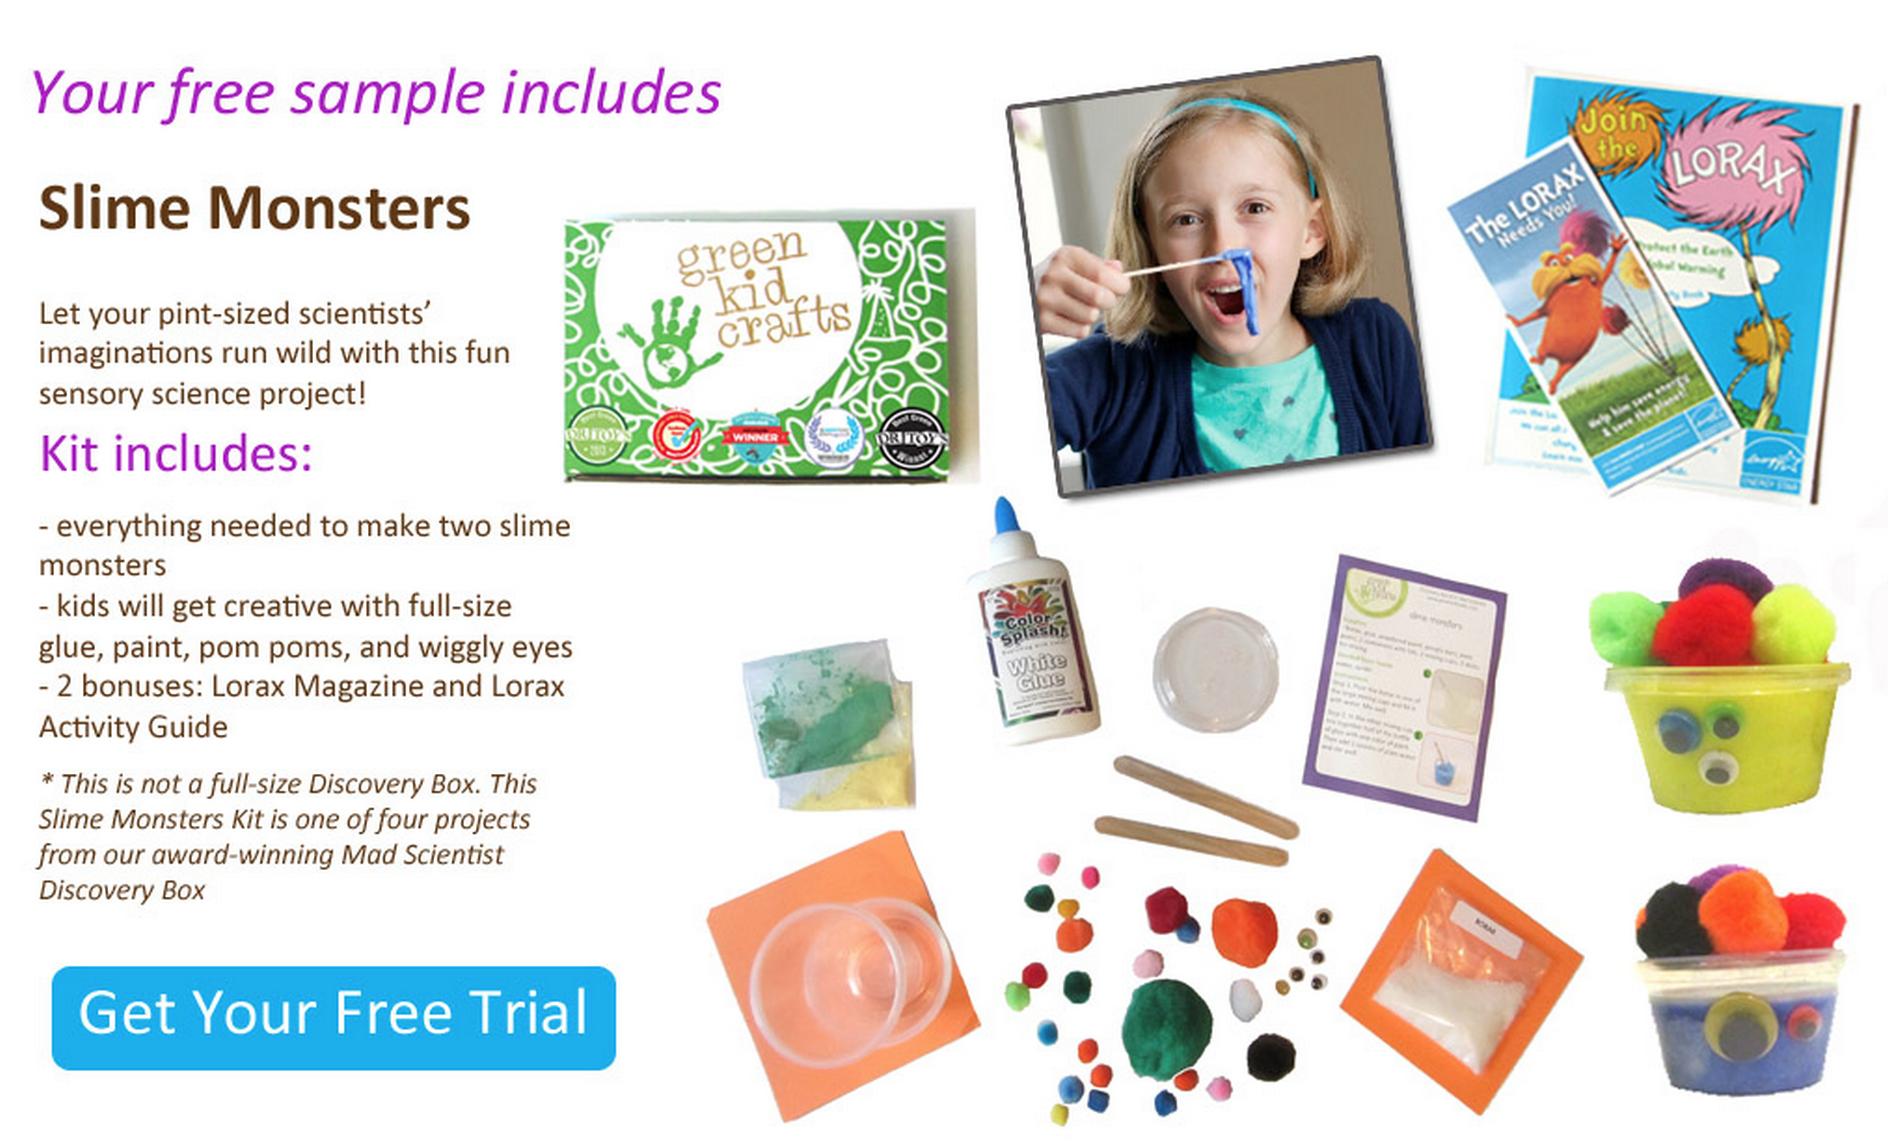 Green Kid Crafts Free Trial Box Offer! Kit